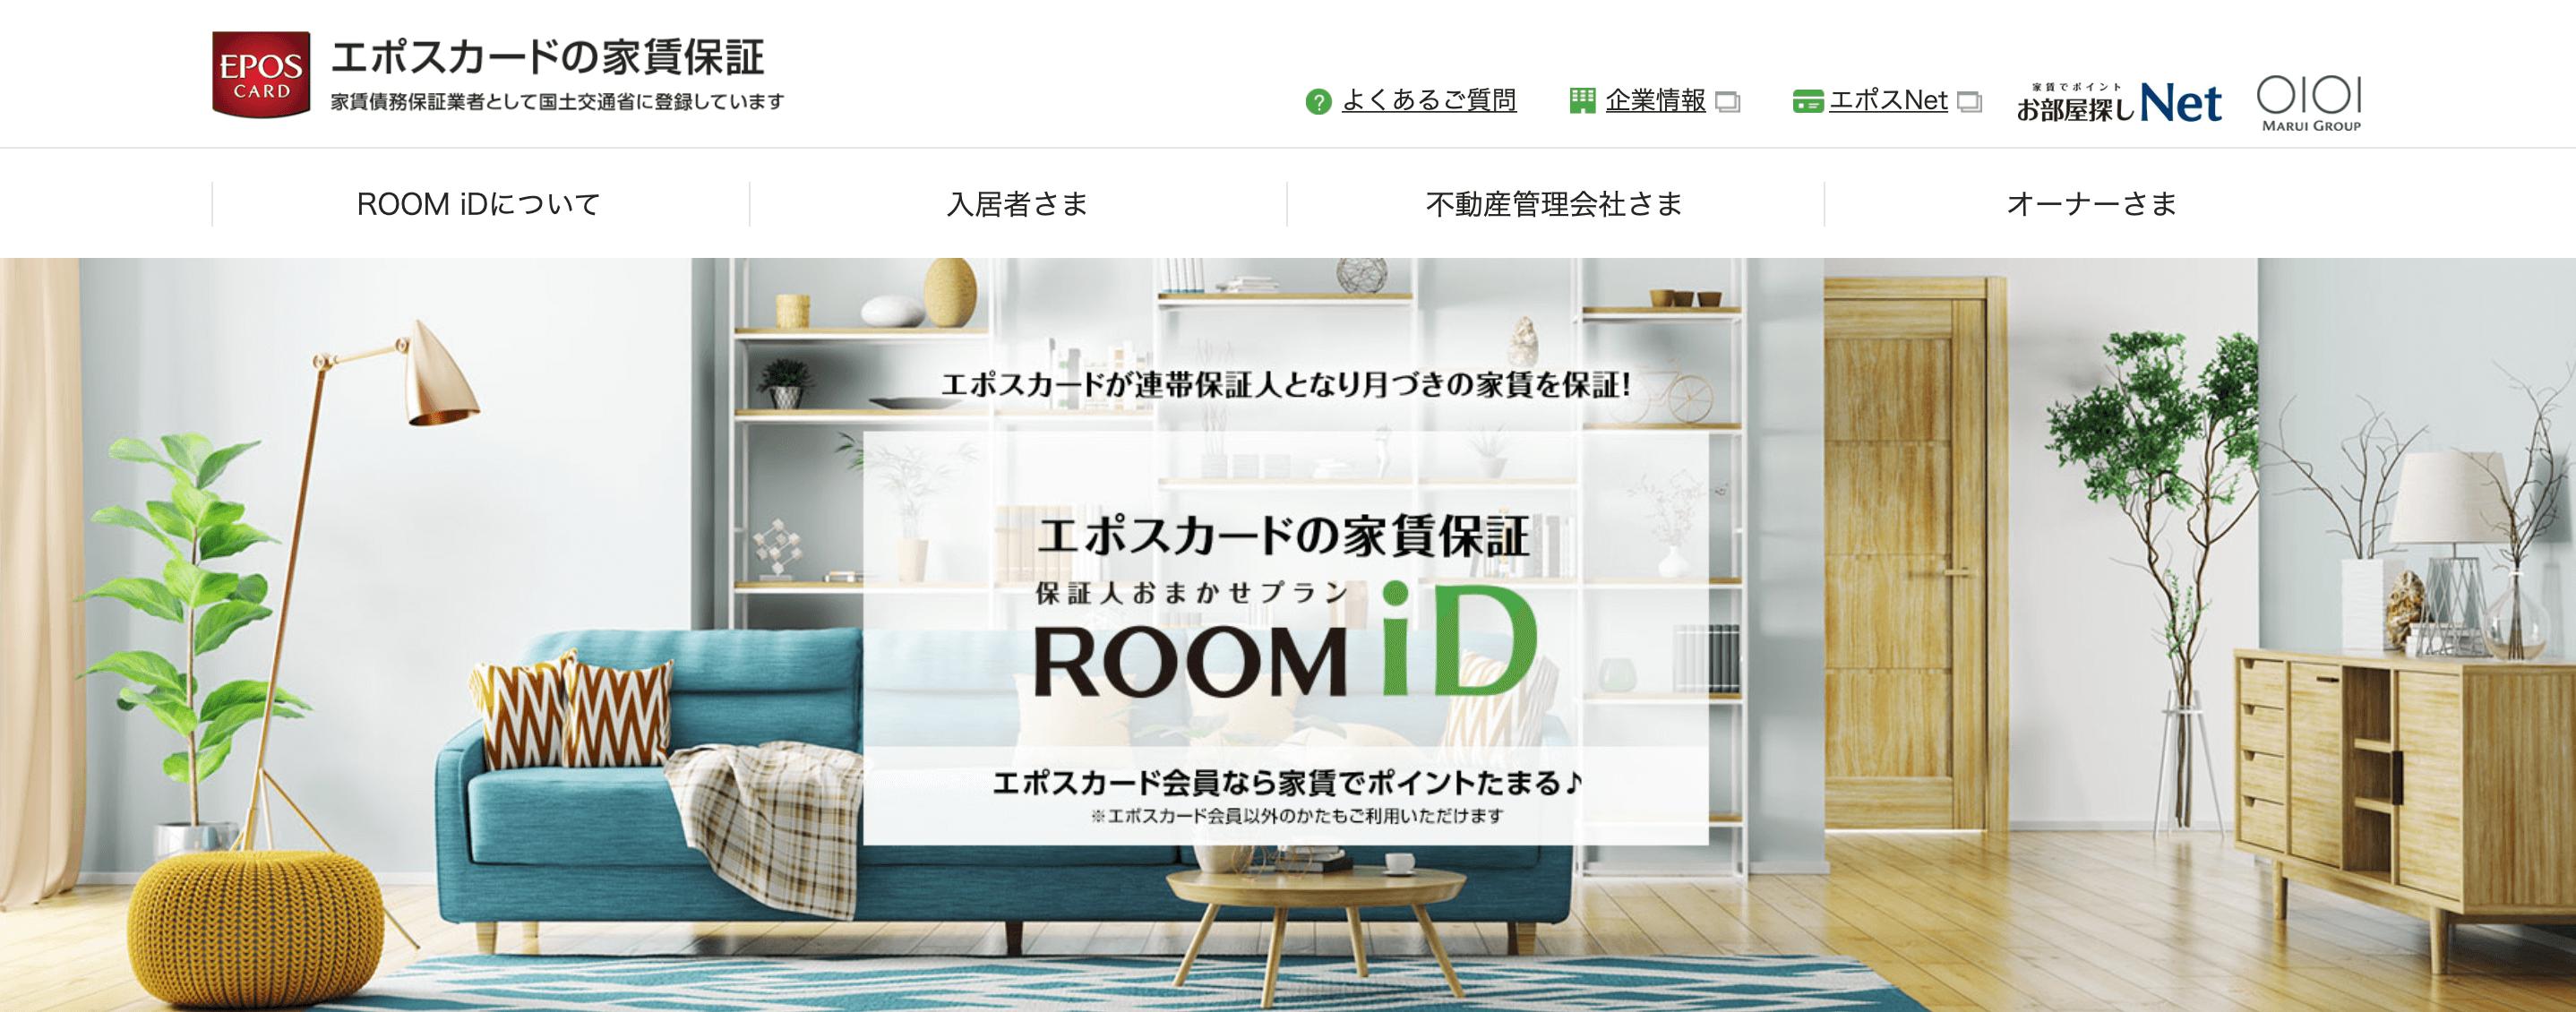 ROOM iDの公式HP